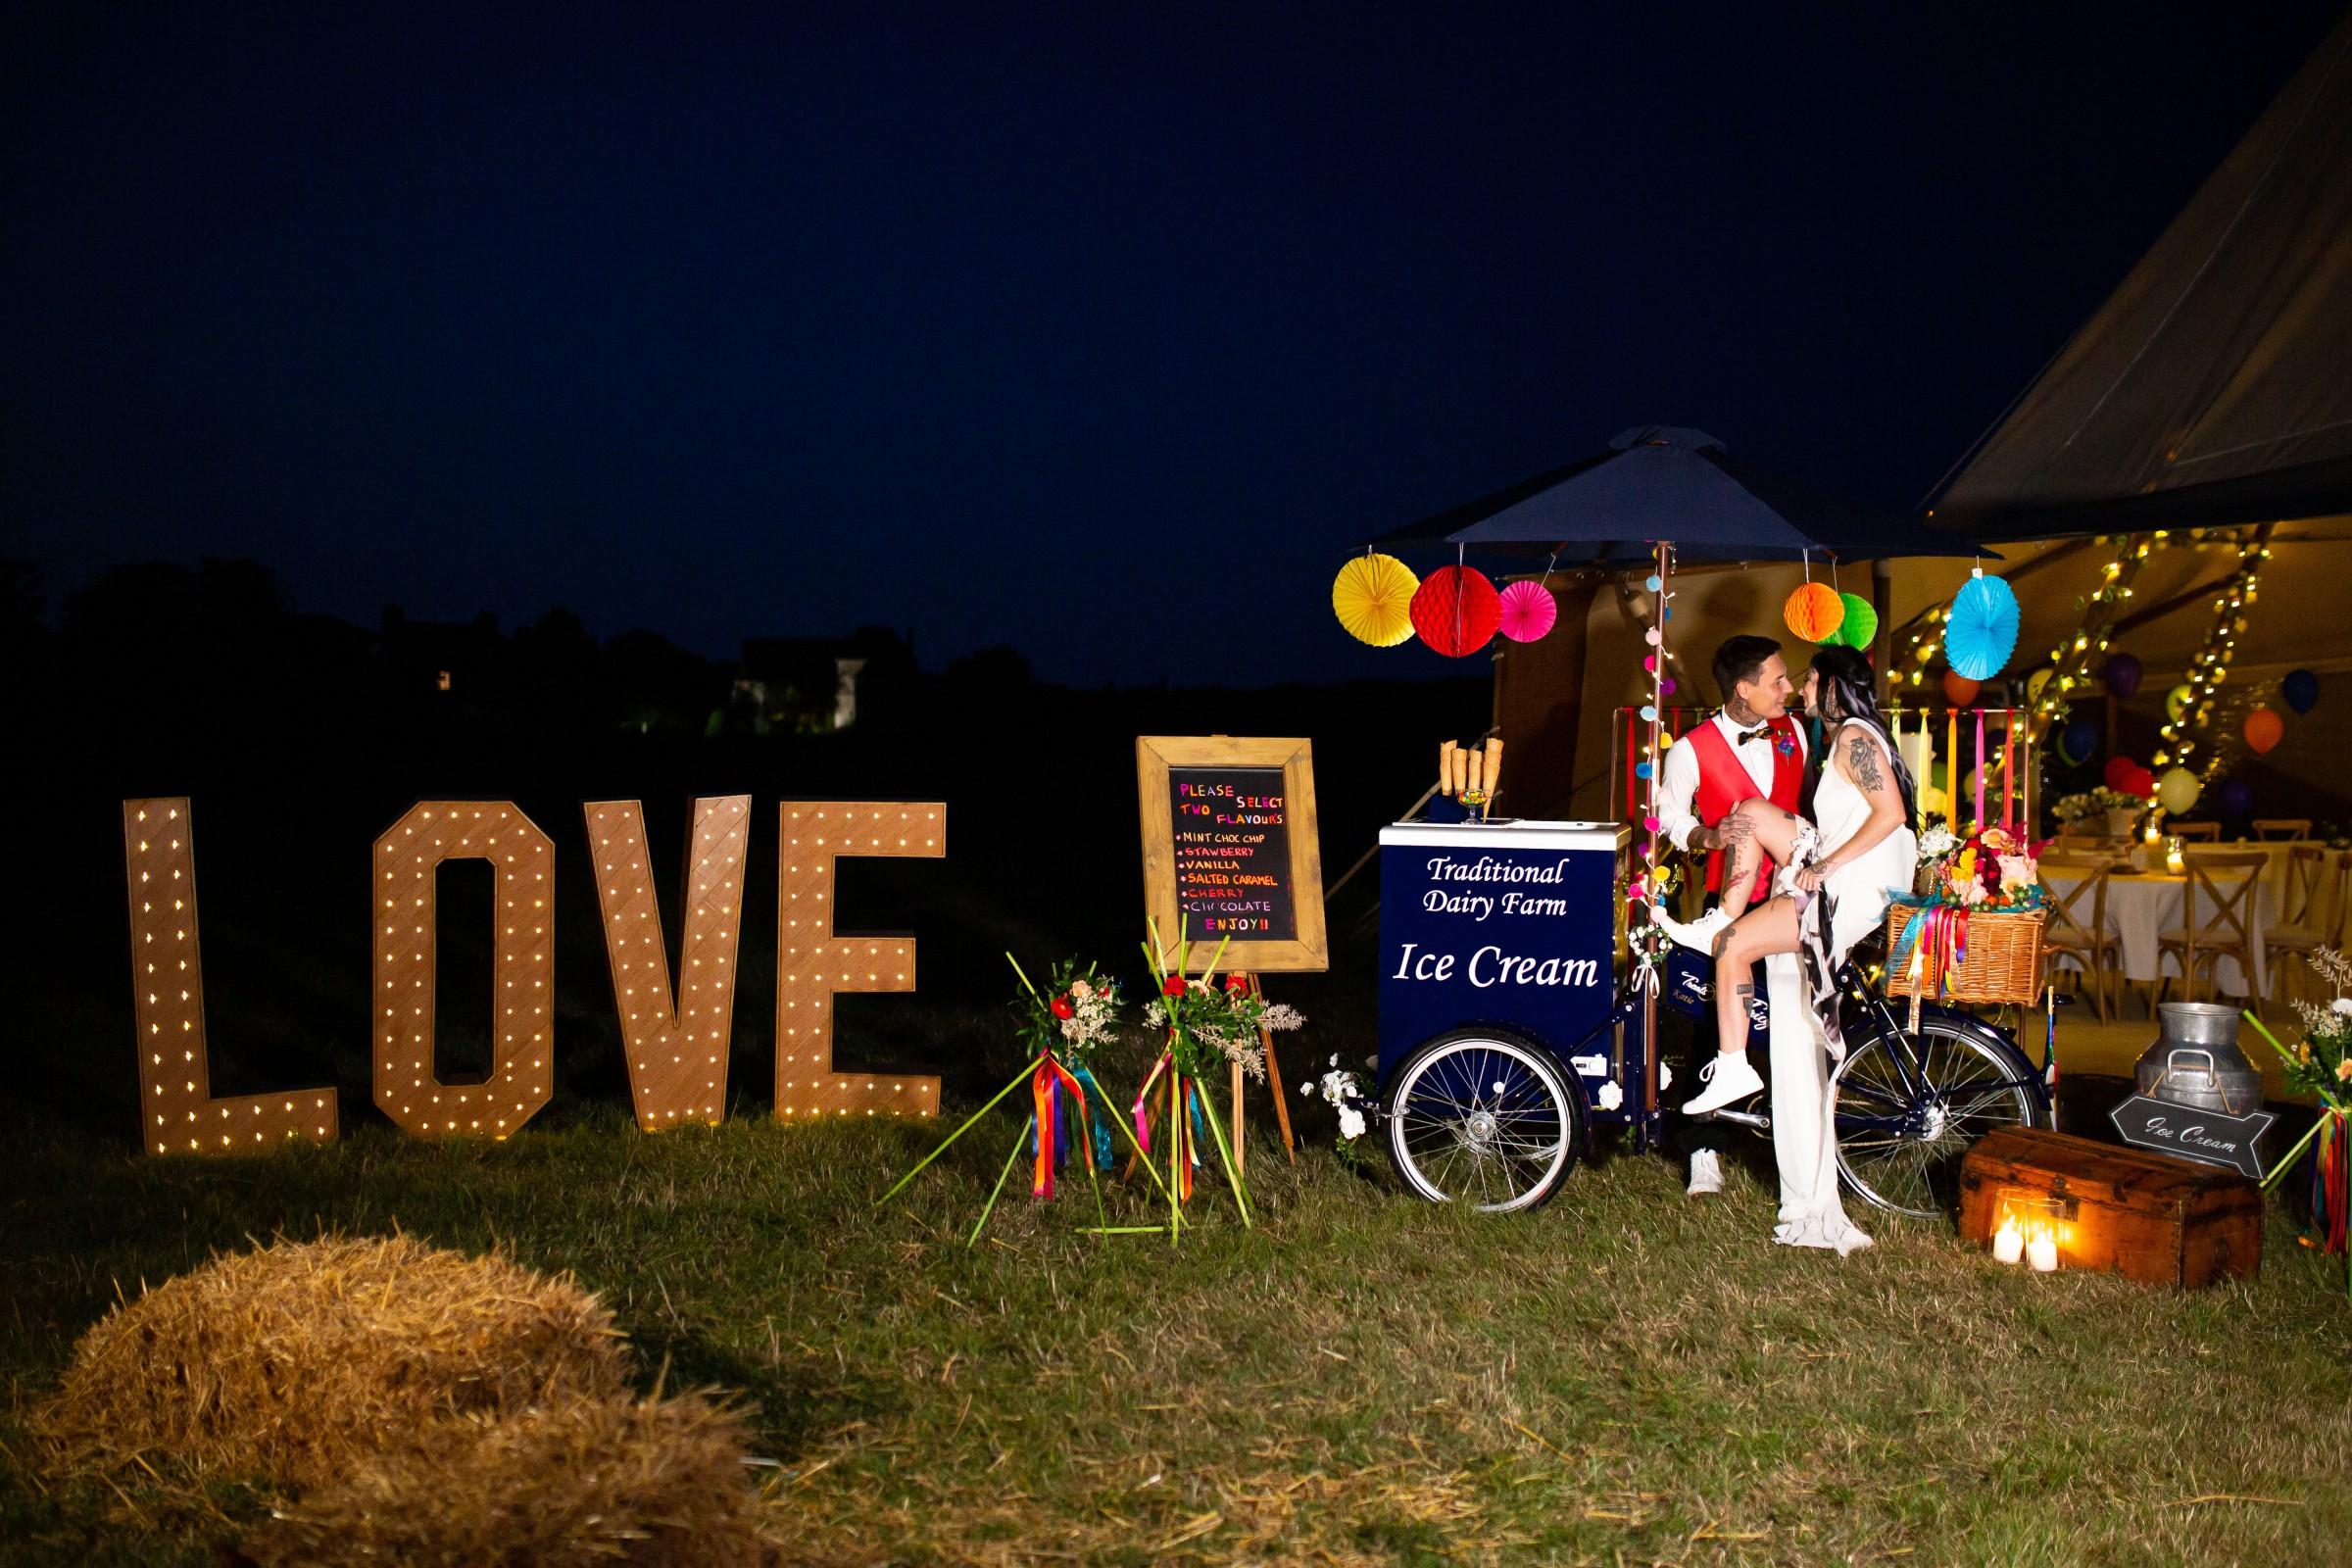 rainbow festival wedding - colourful wedding - quirky wedding ideas - love light up sign - wedding ice cream cart